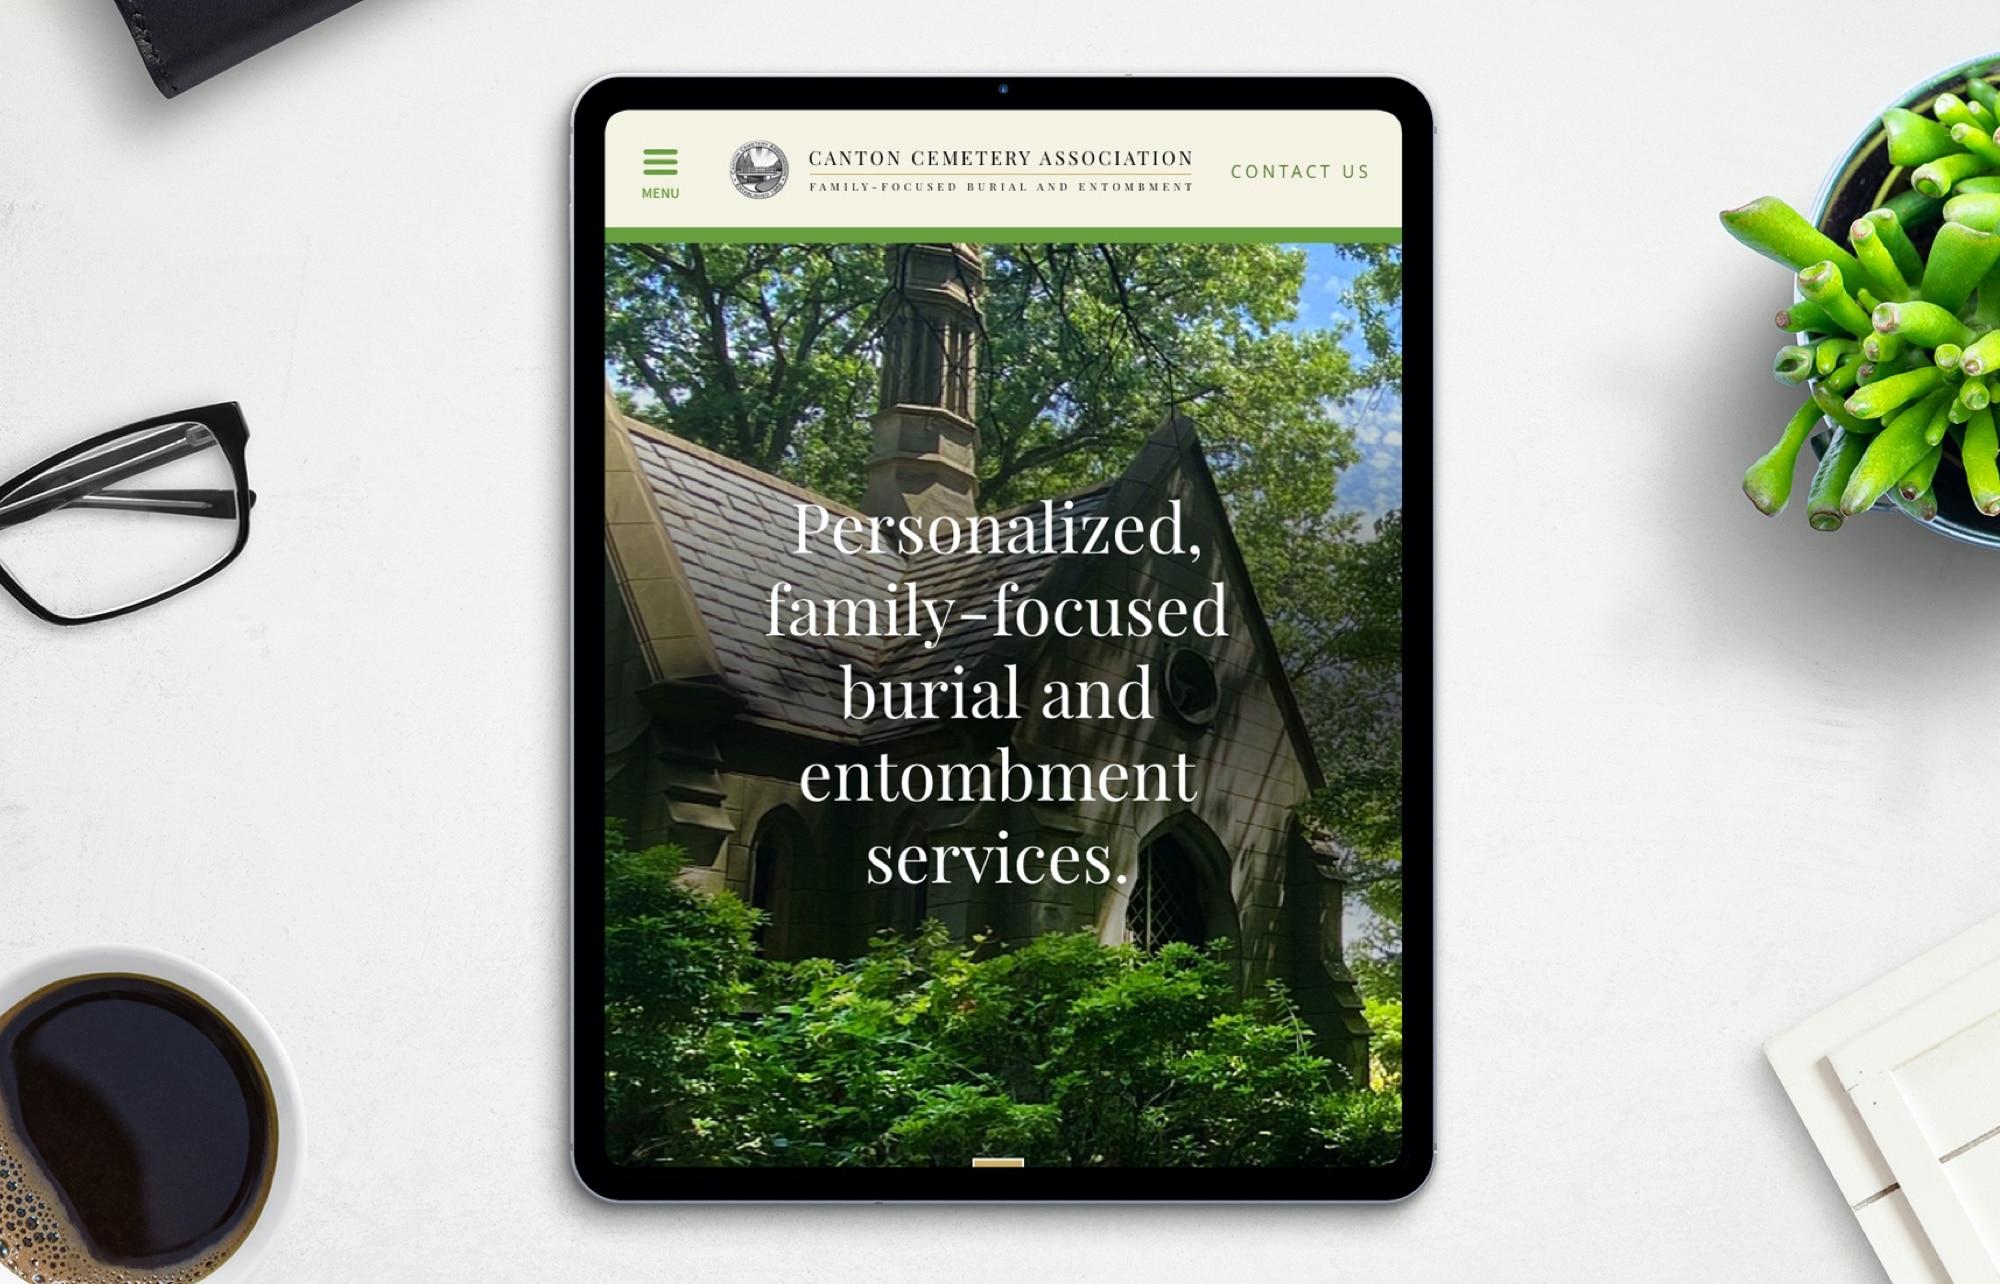 Canton-Cemetery-Website-Desktop-Tablet-Mobile Copy